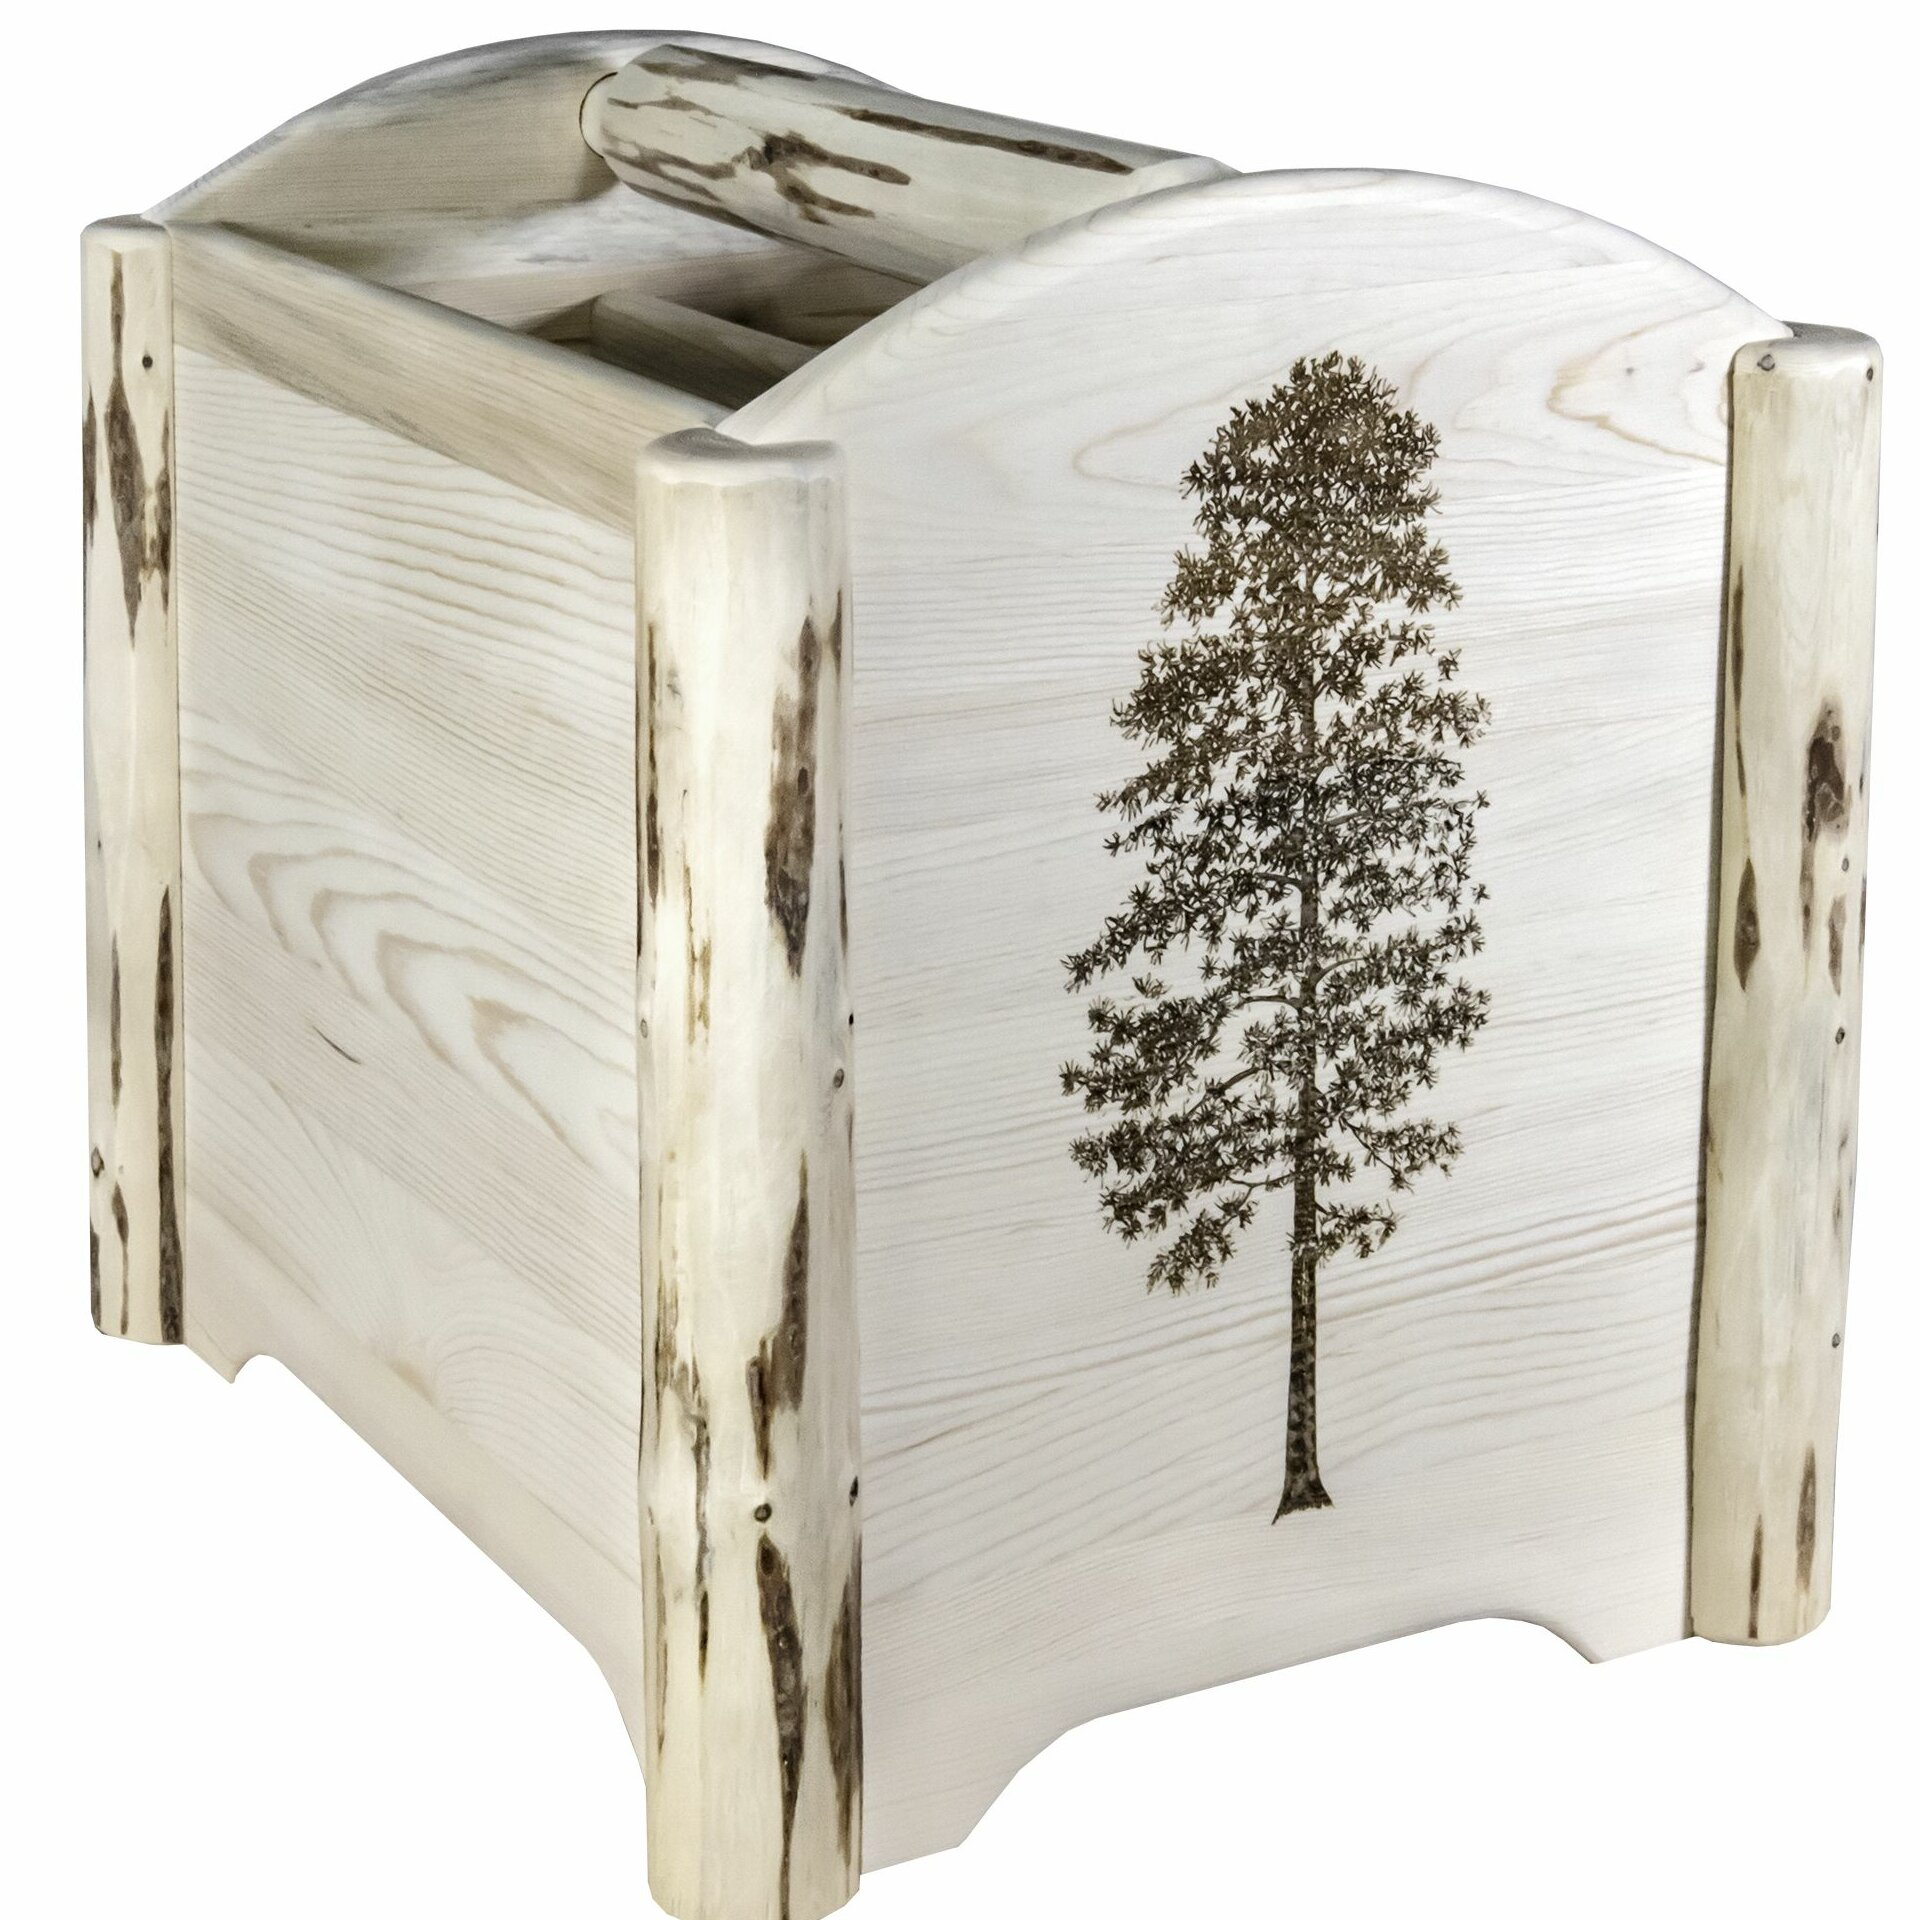 Millwood Pines Silber Laser Engraved Magazine Rack Wayfair Ca